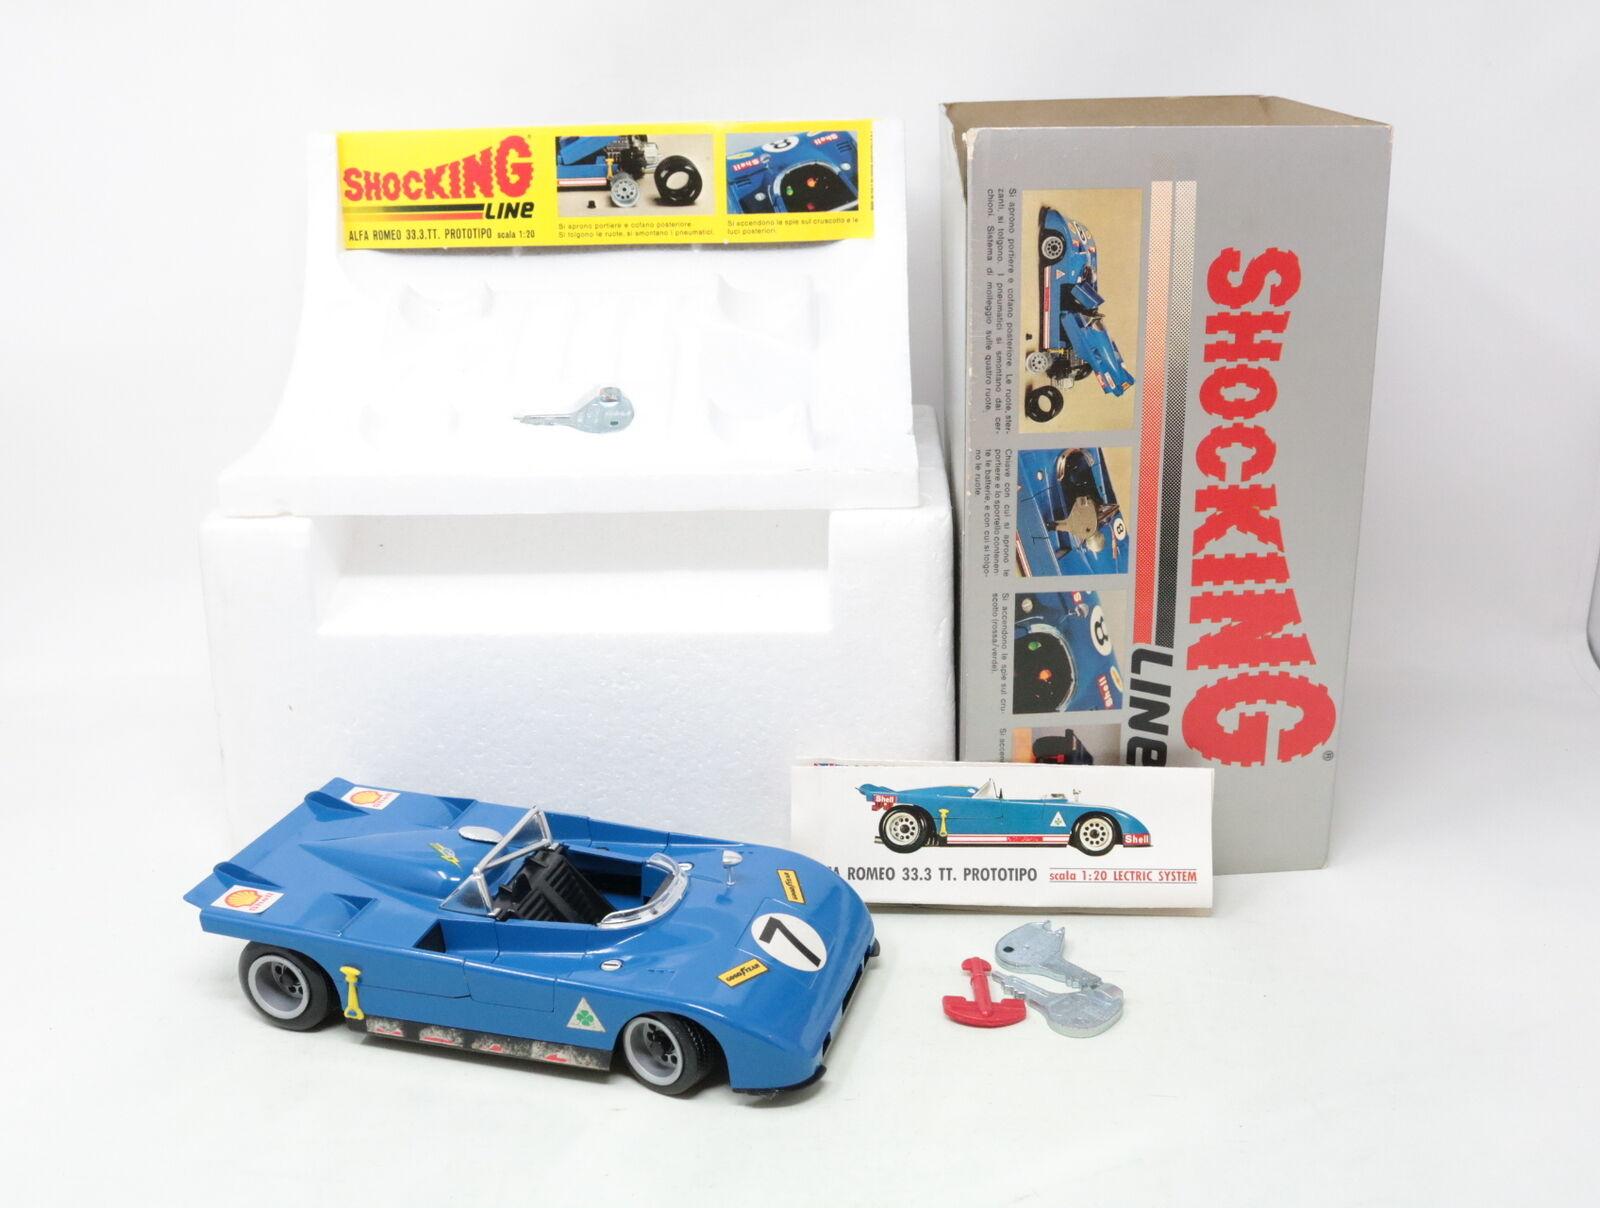 1 : 20 EGショッキングラインAlfa Romeo 33.3 TTプロトタイプCOD[ XS - 004 ]